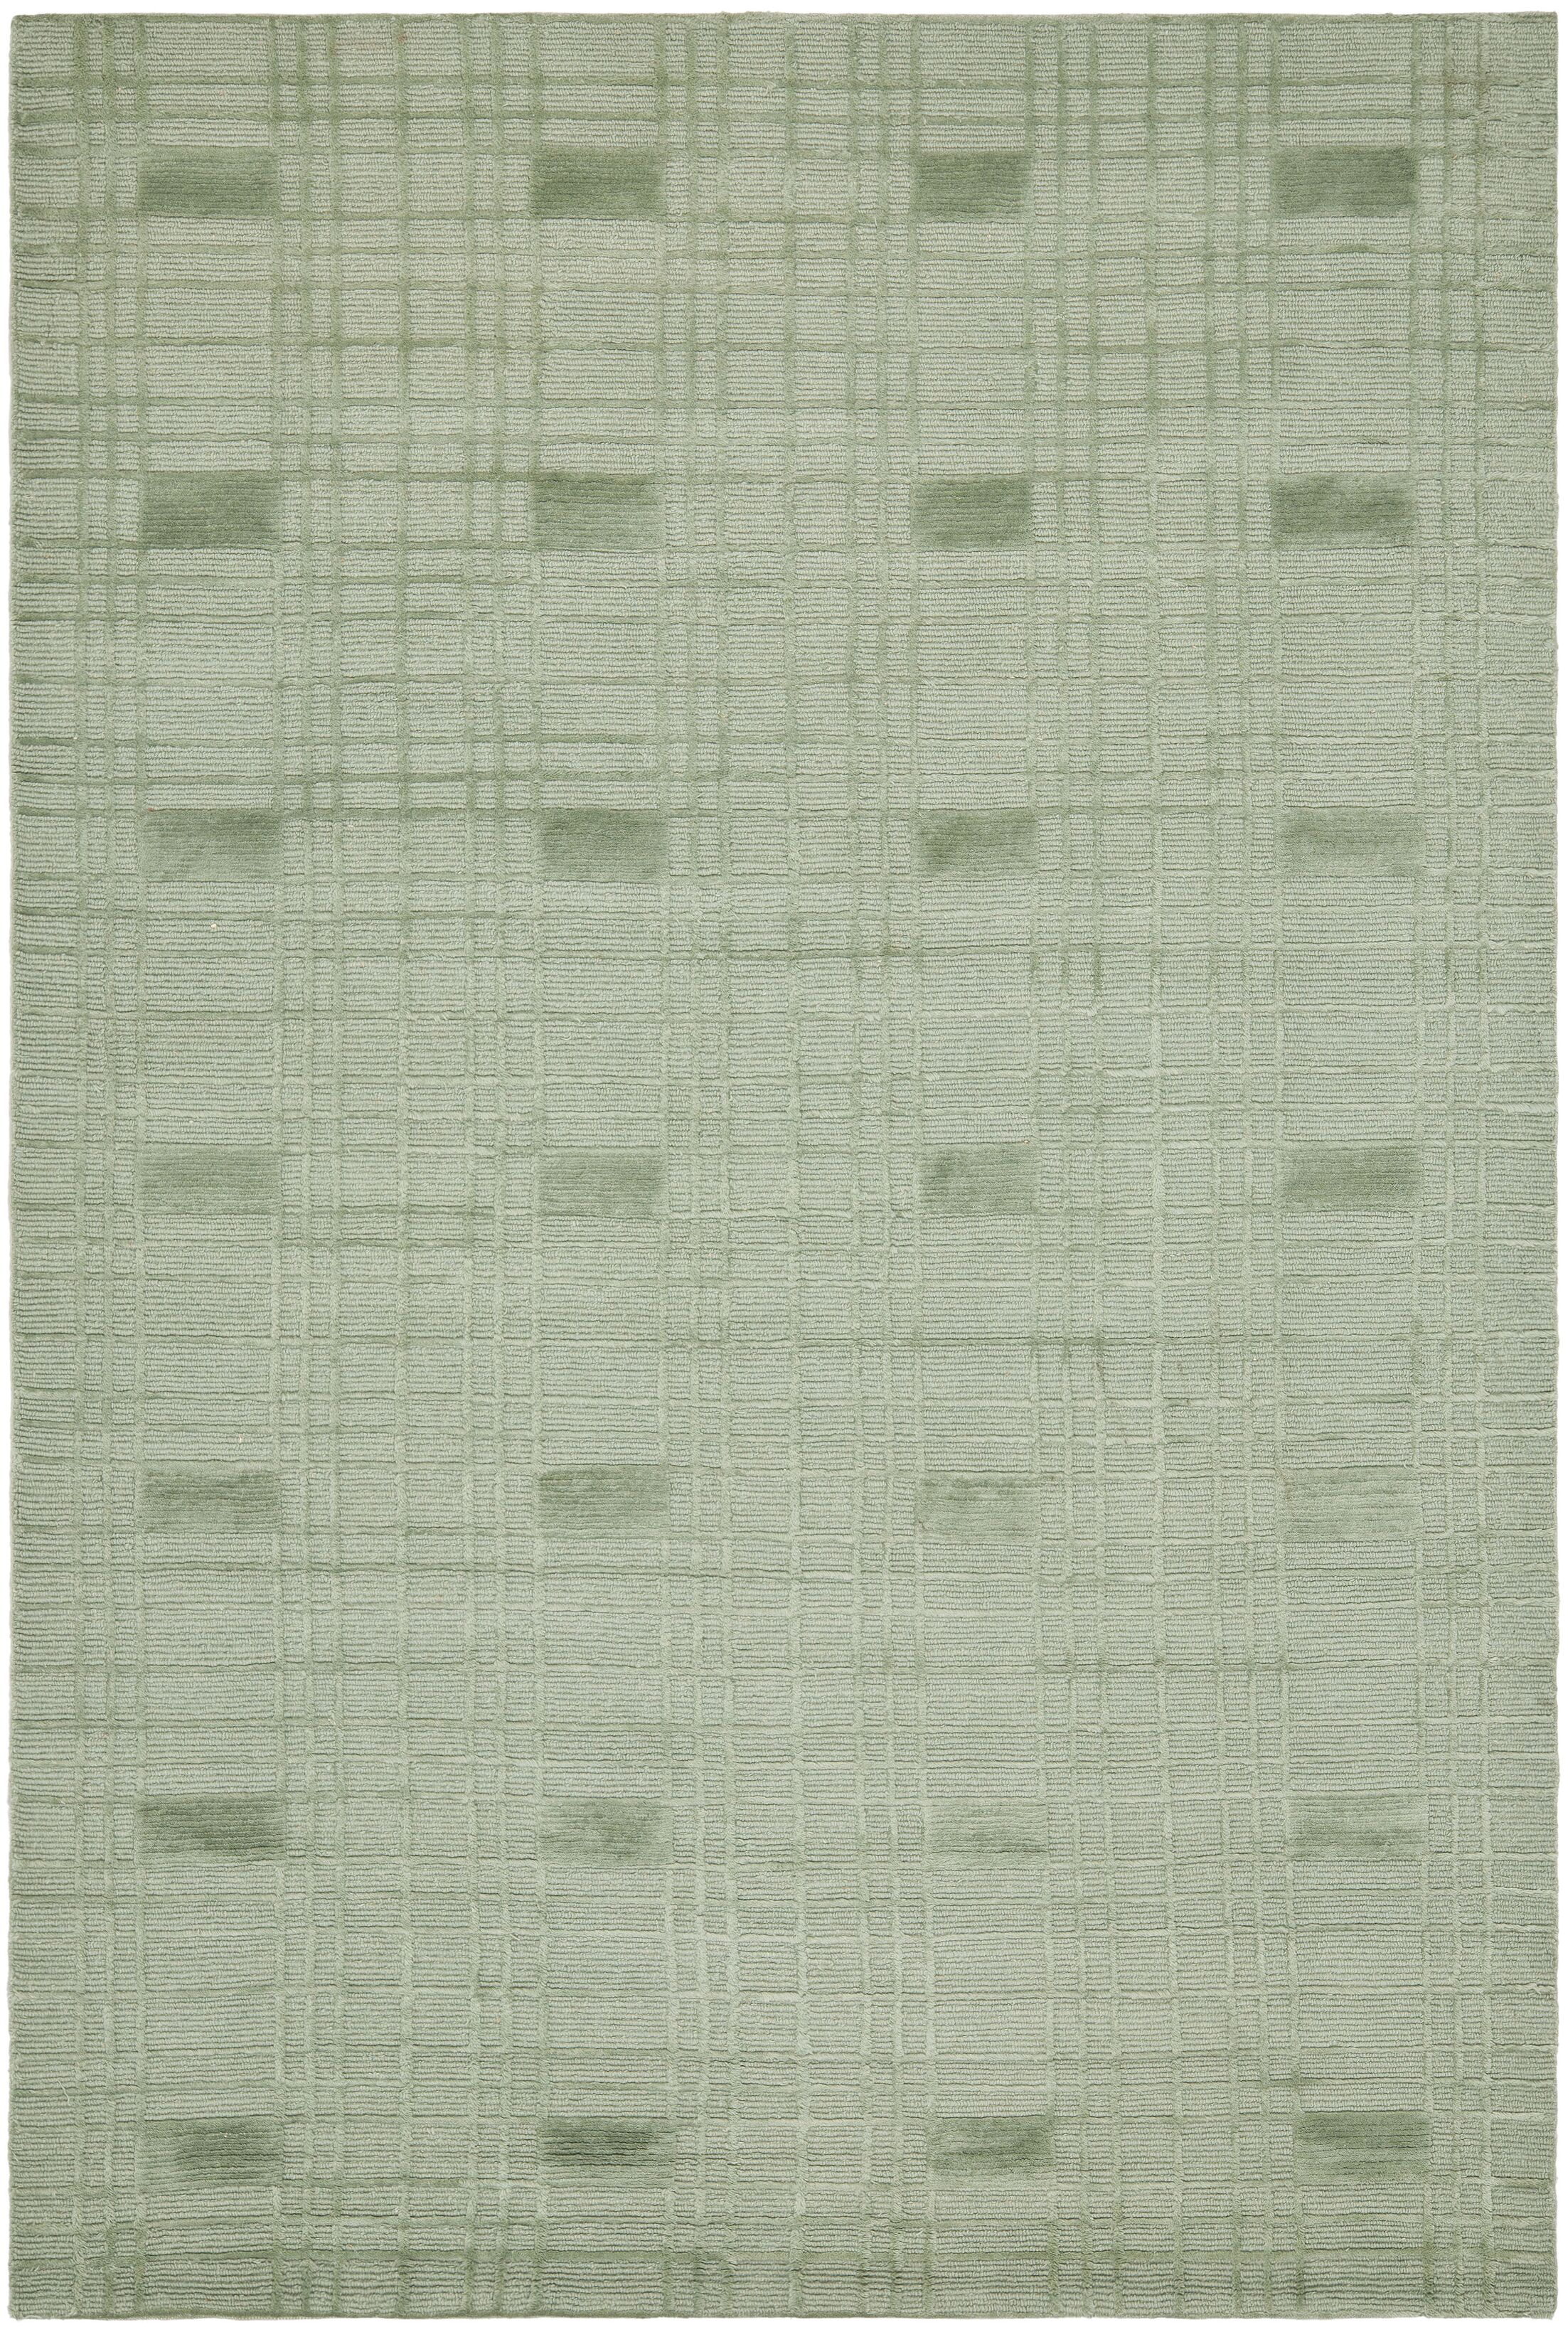 Celadon Rug Rug Size: Rectangle 6' x 9'